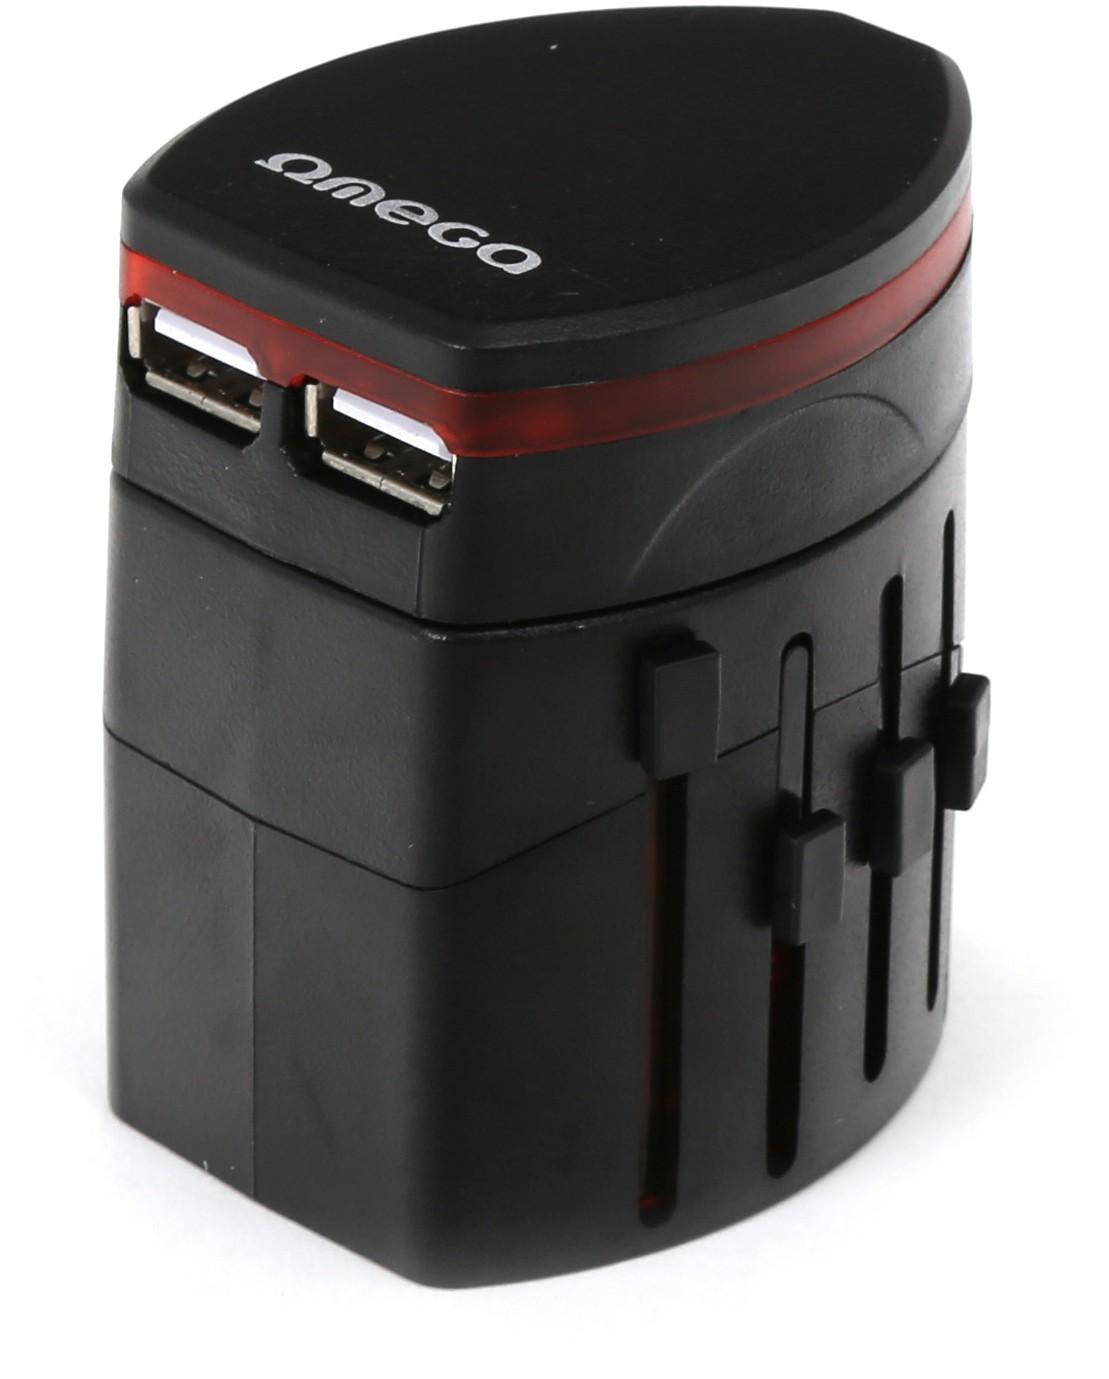 Omega reisiadapter 4in1 USB, must (43354..